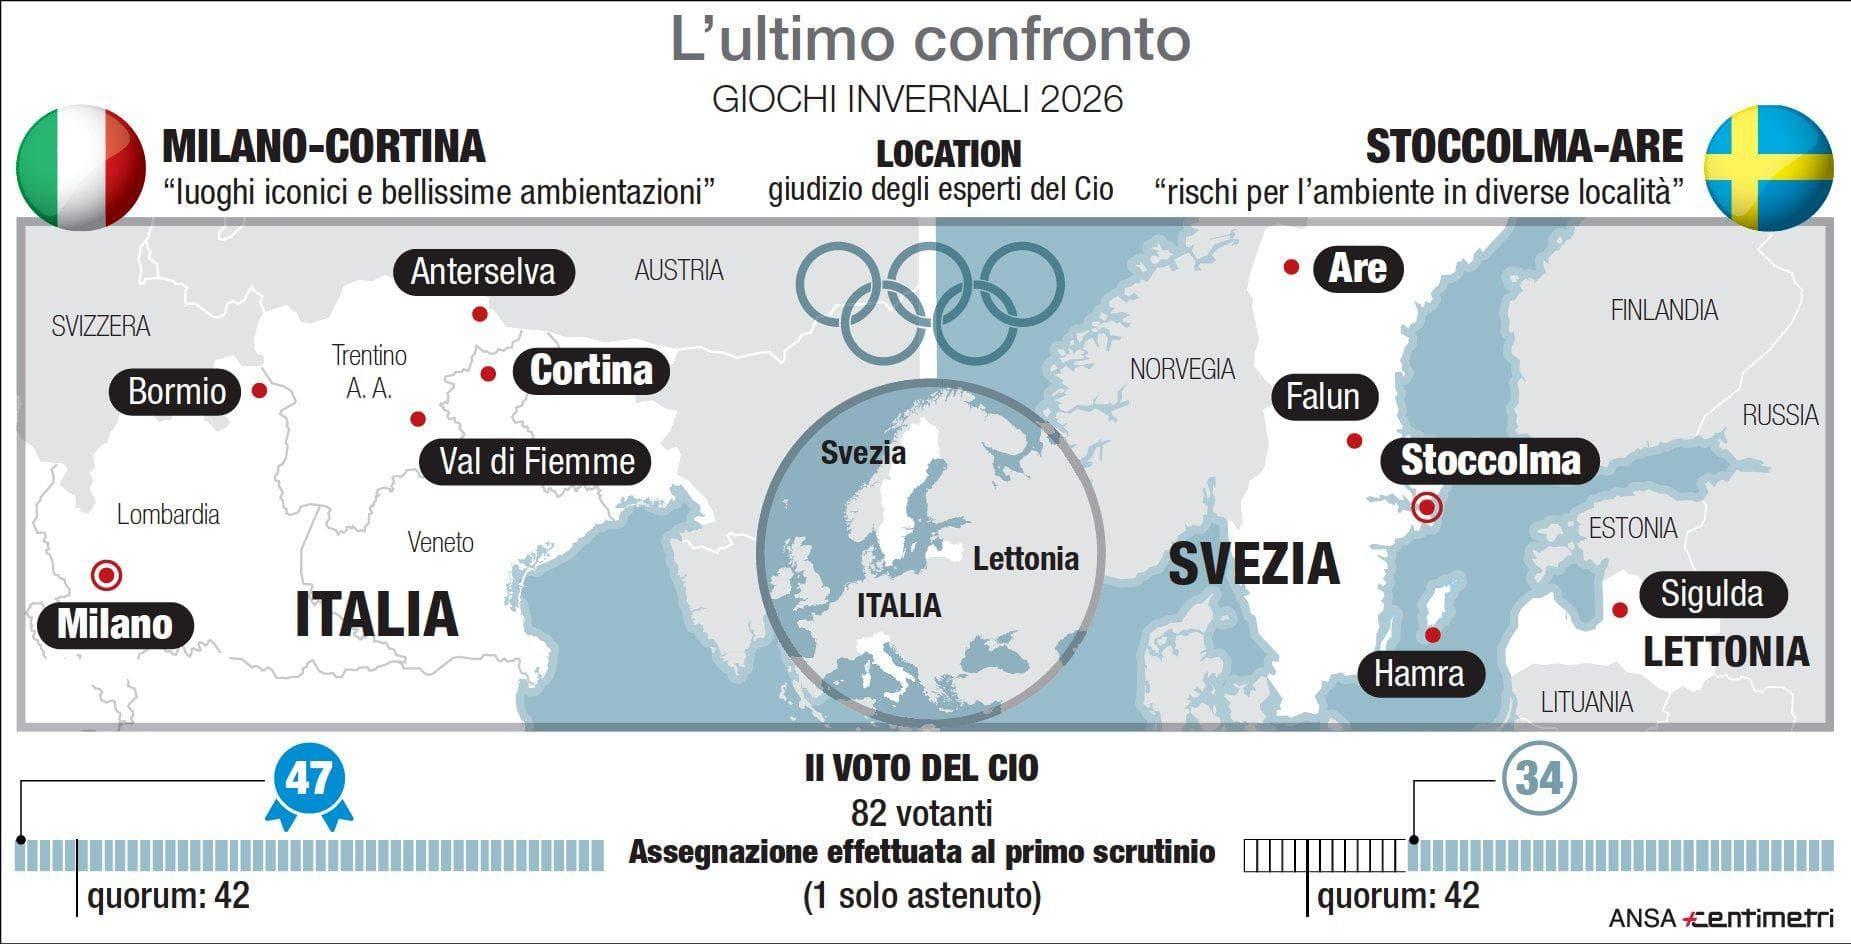 olimpiadi 2026 milano cortina infografica-2